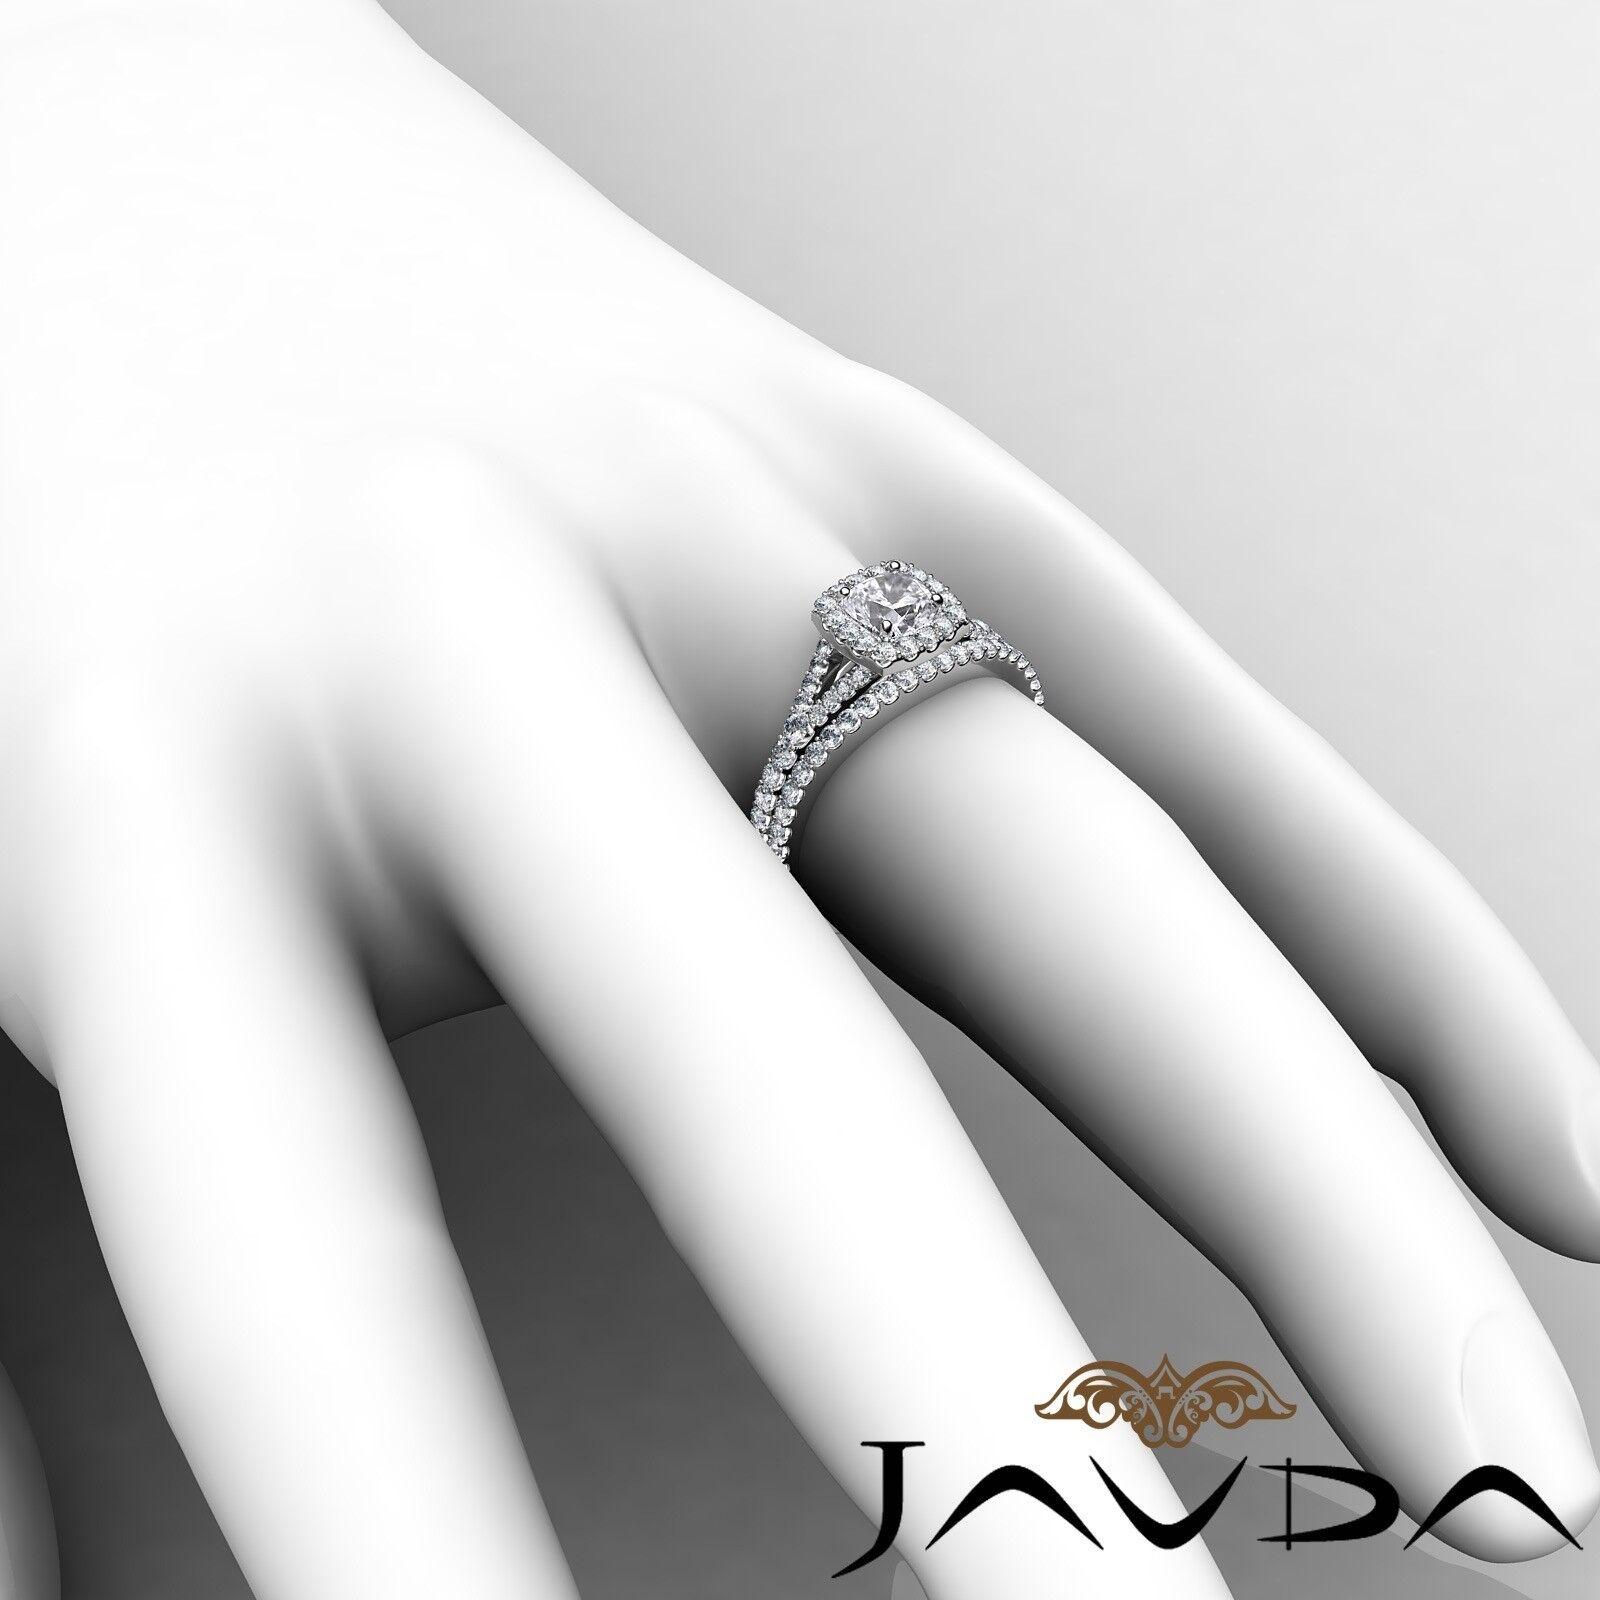 1.5ctw U Cut Pave Halo Bridal Cushion Diamond Engagement Ring GIA F-VS2 W Gold 6